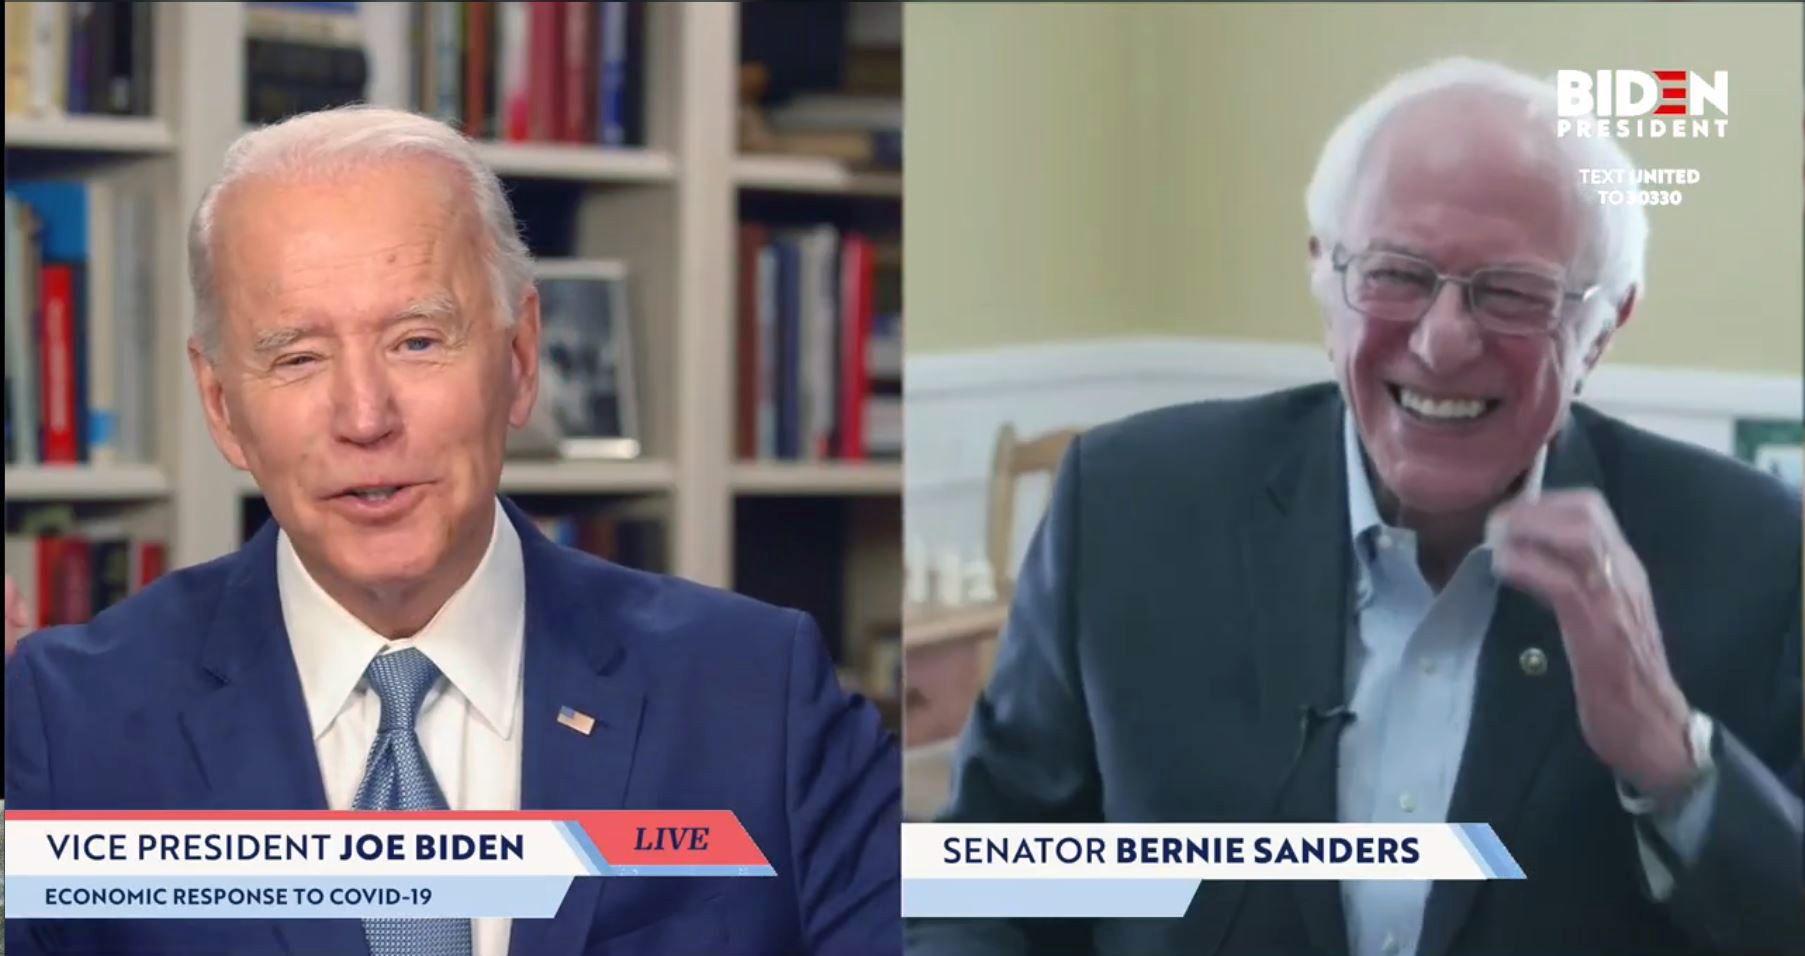 Bernie Sanders's Endorsement of Joe Biden Was a Public Demonstration of Their Common Goal